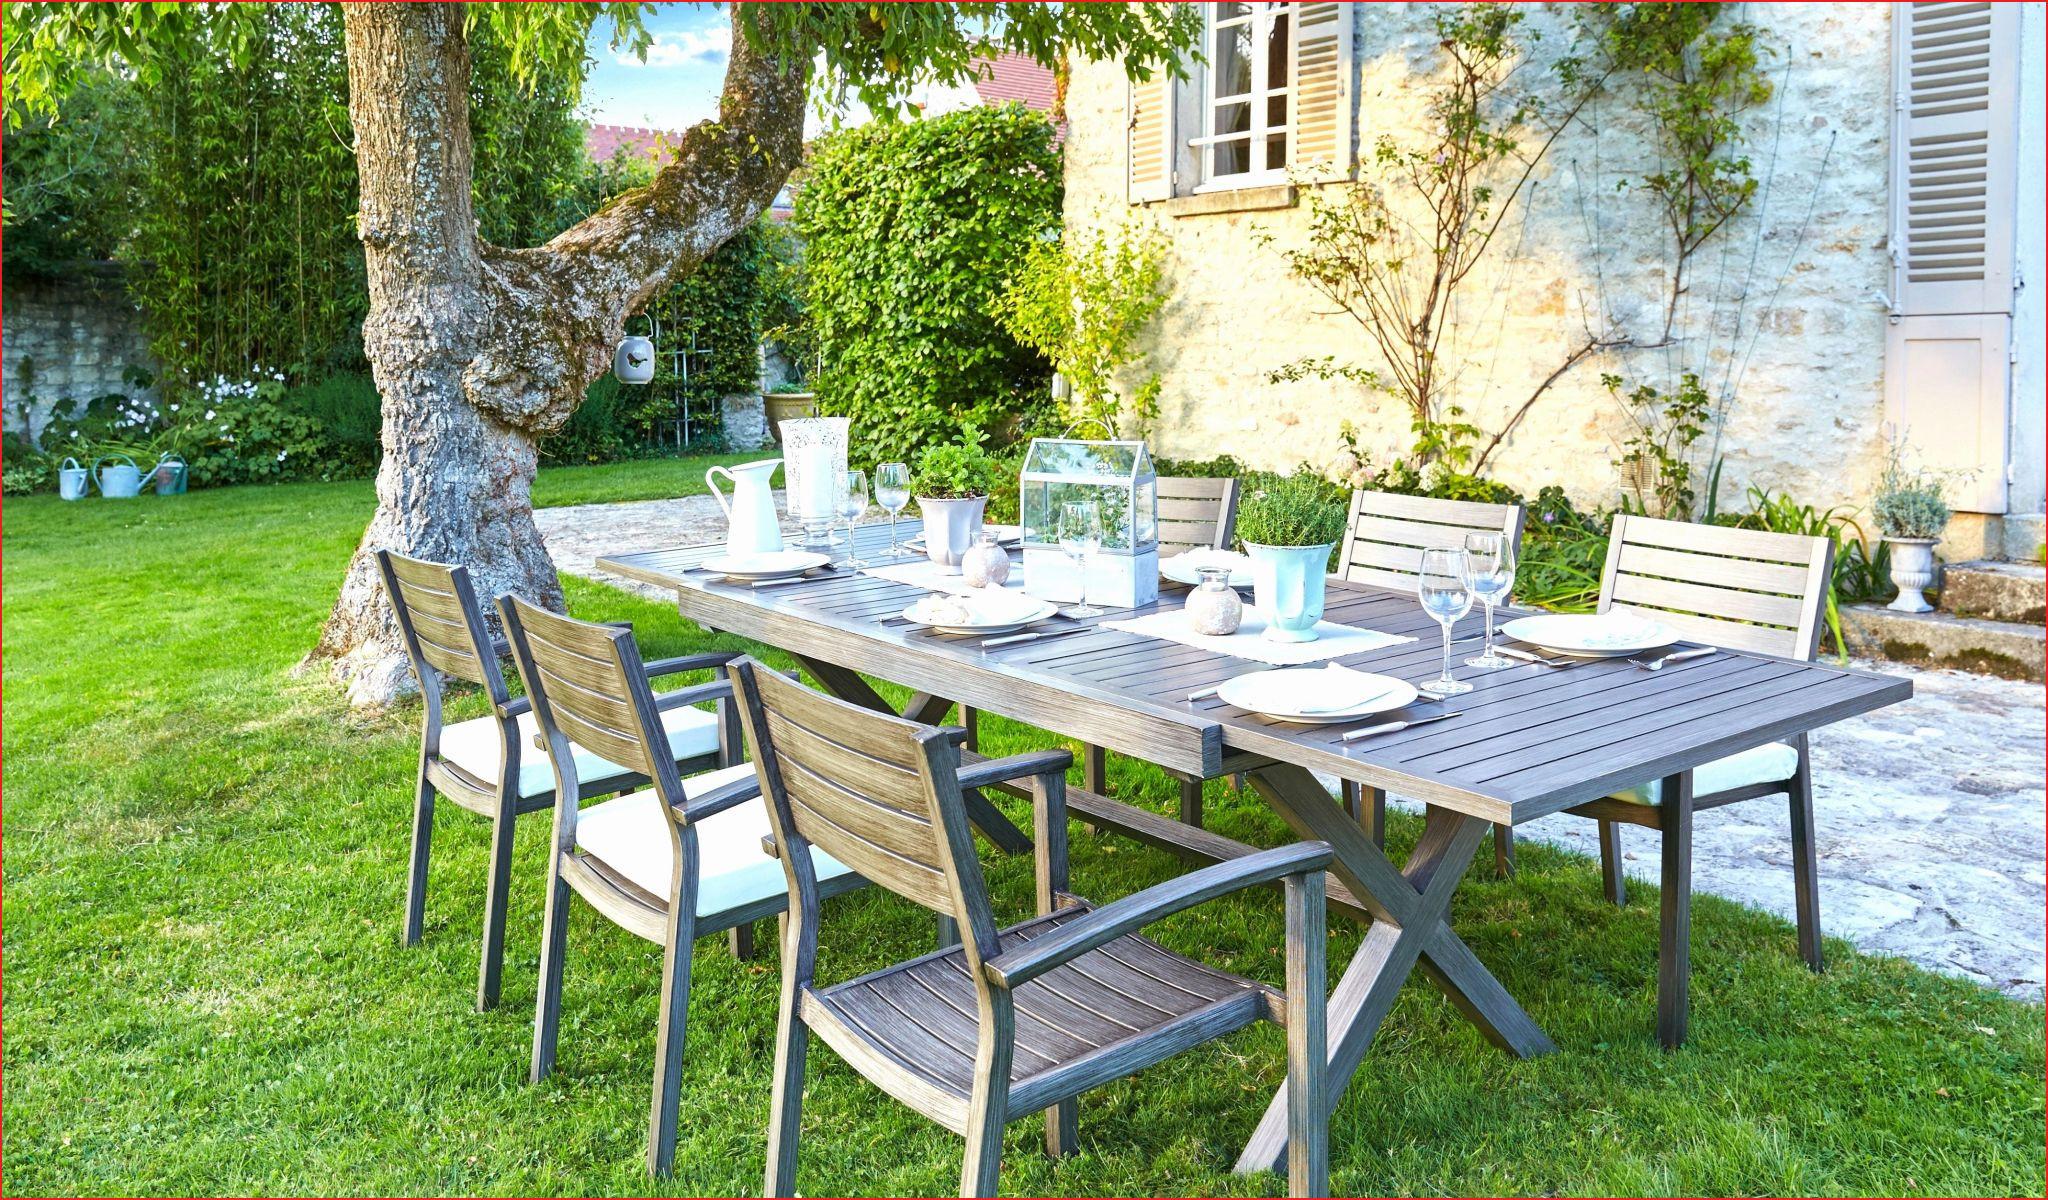 24 Charmant Table Jardin Resine | Salon Jardin tout Camif Jardin